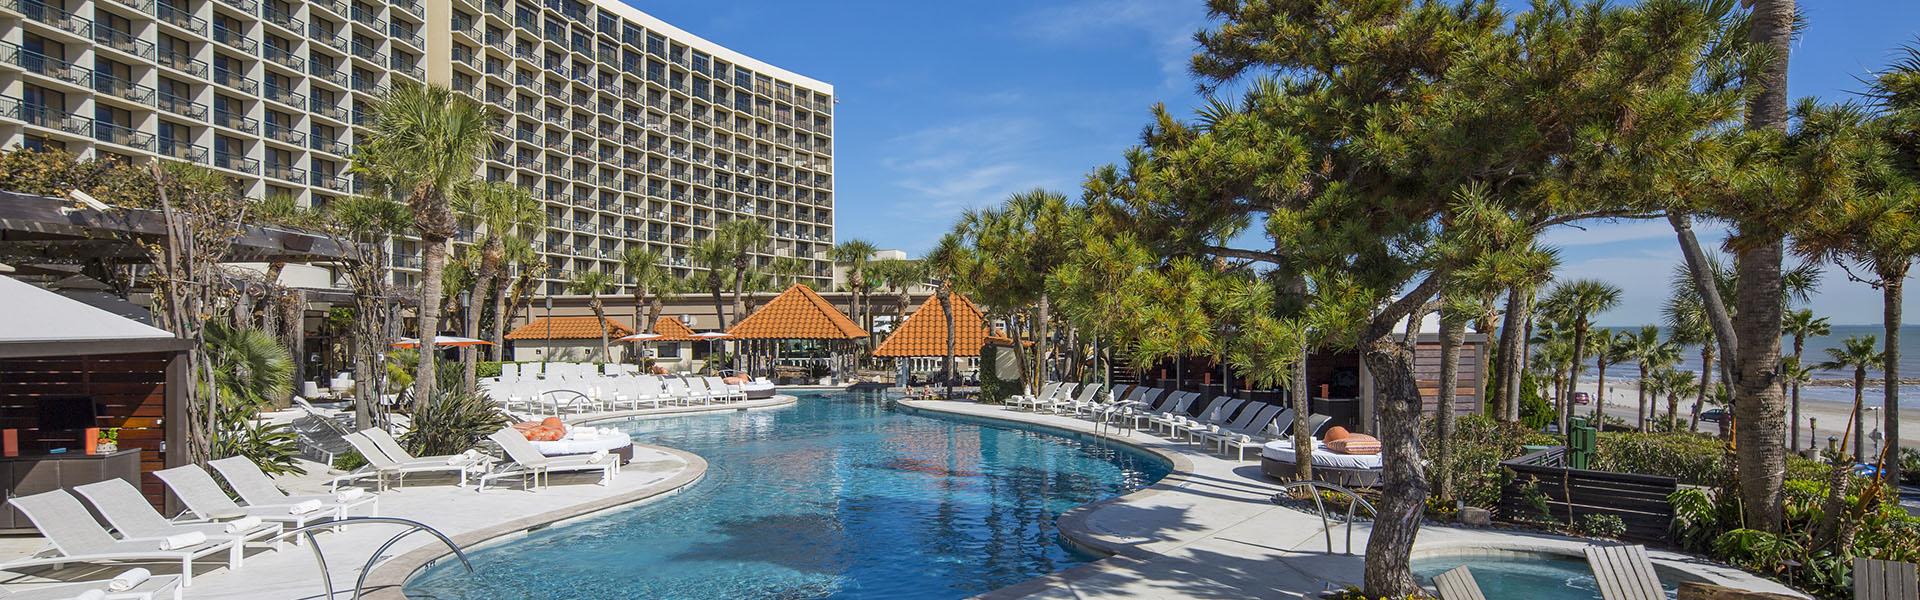 San Luis Resort Spa & Conference Center